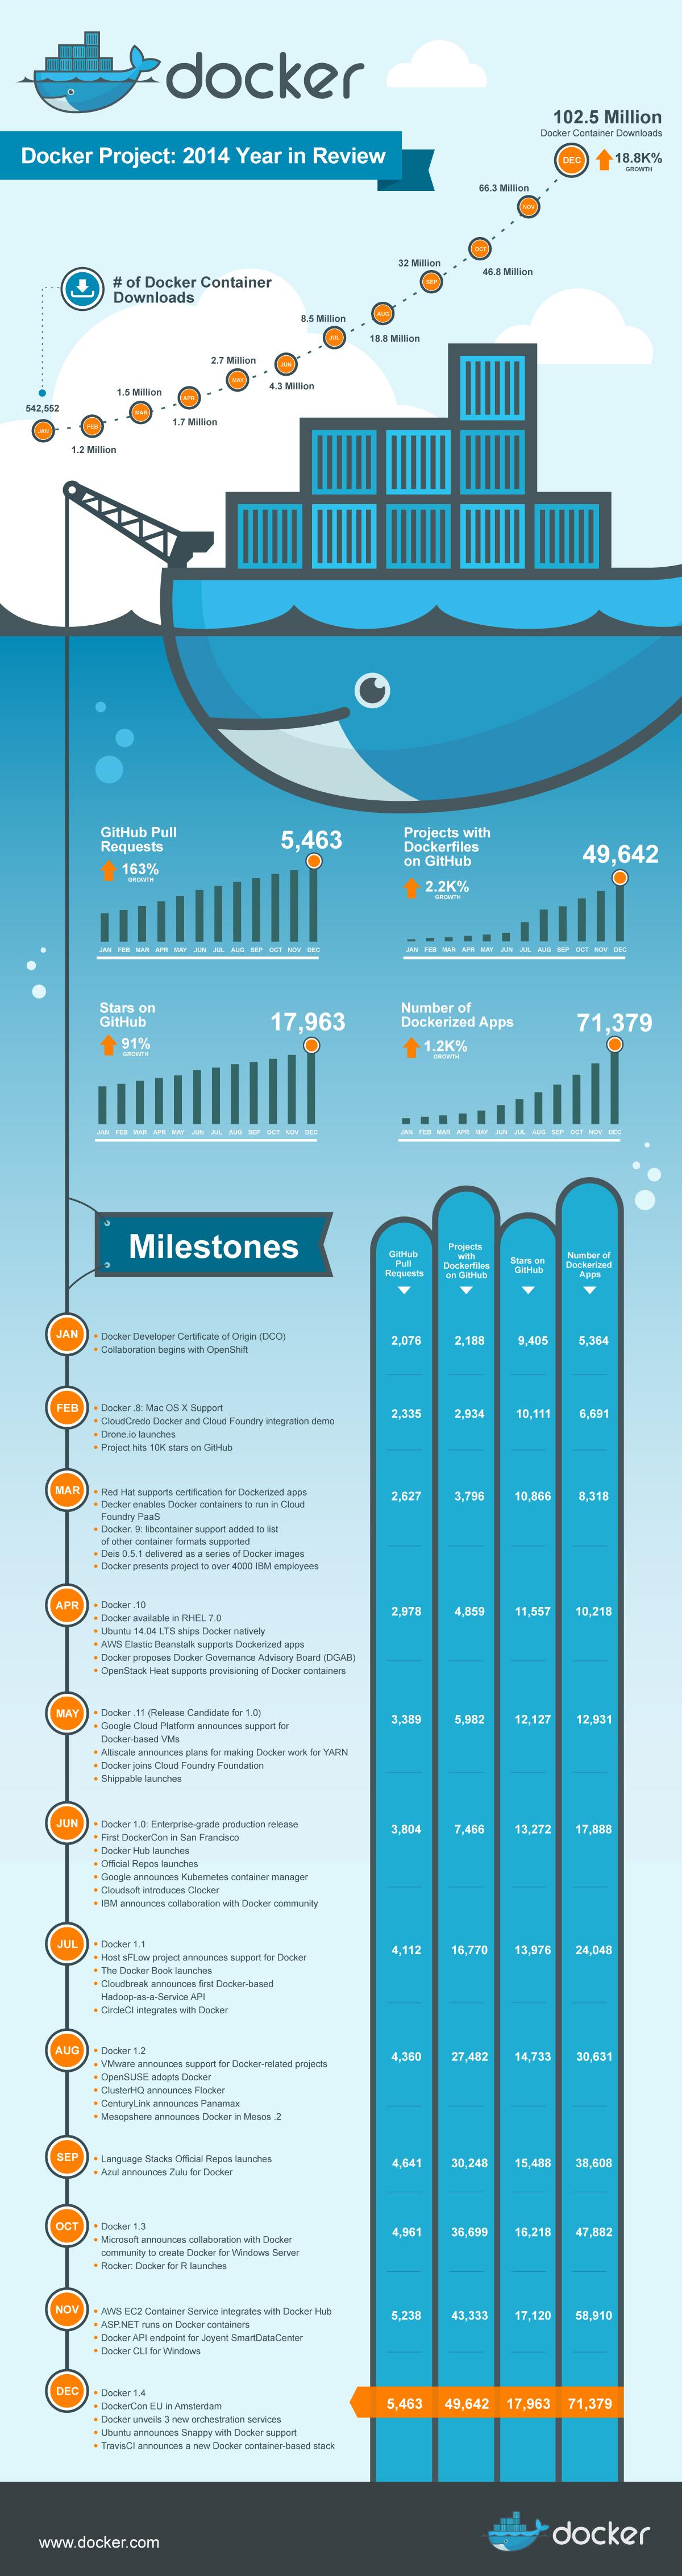 Docker's 2014 year in review.